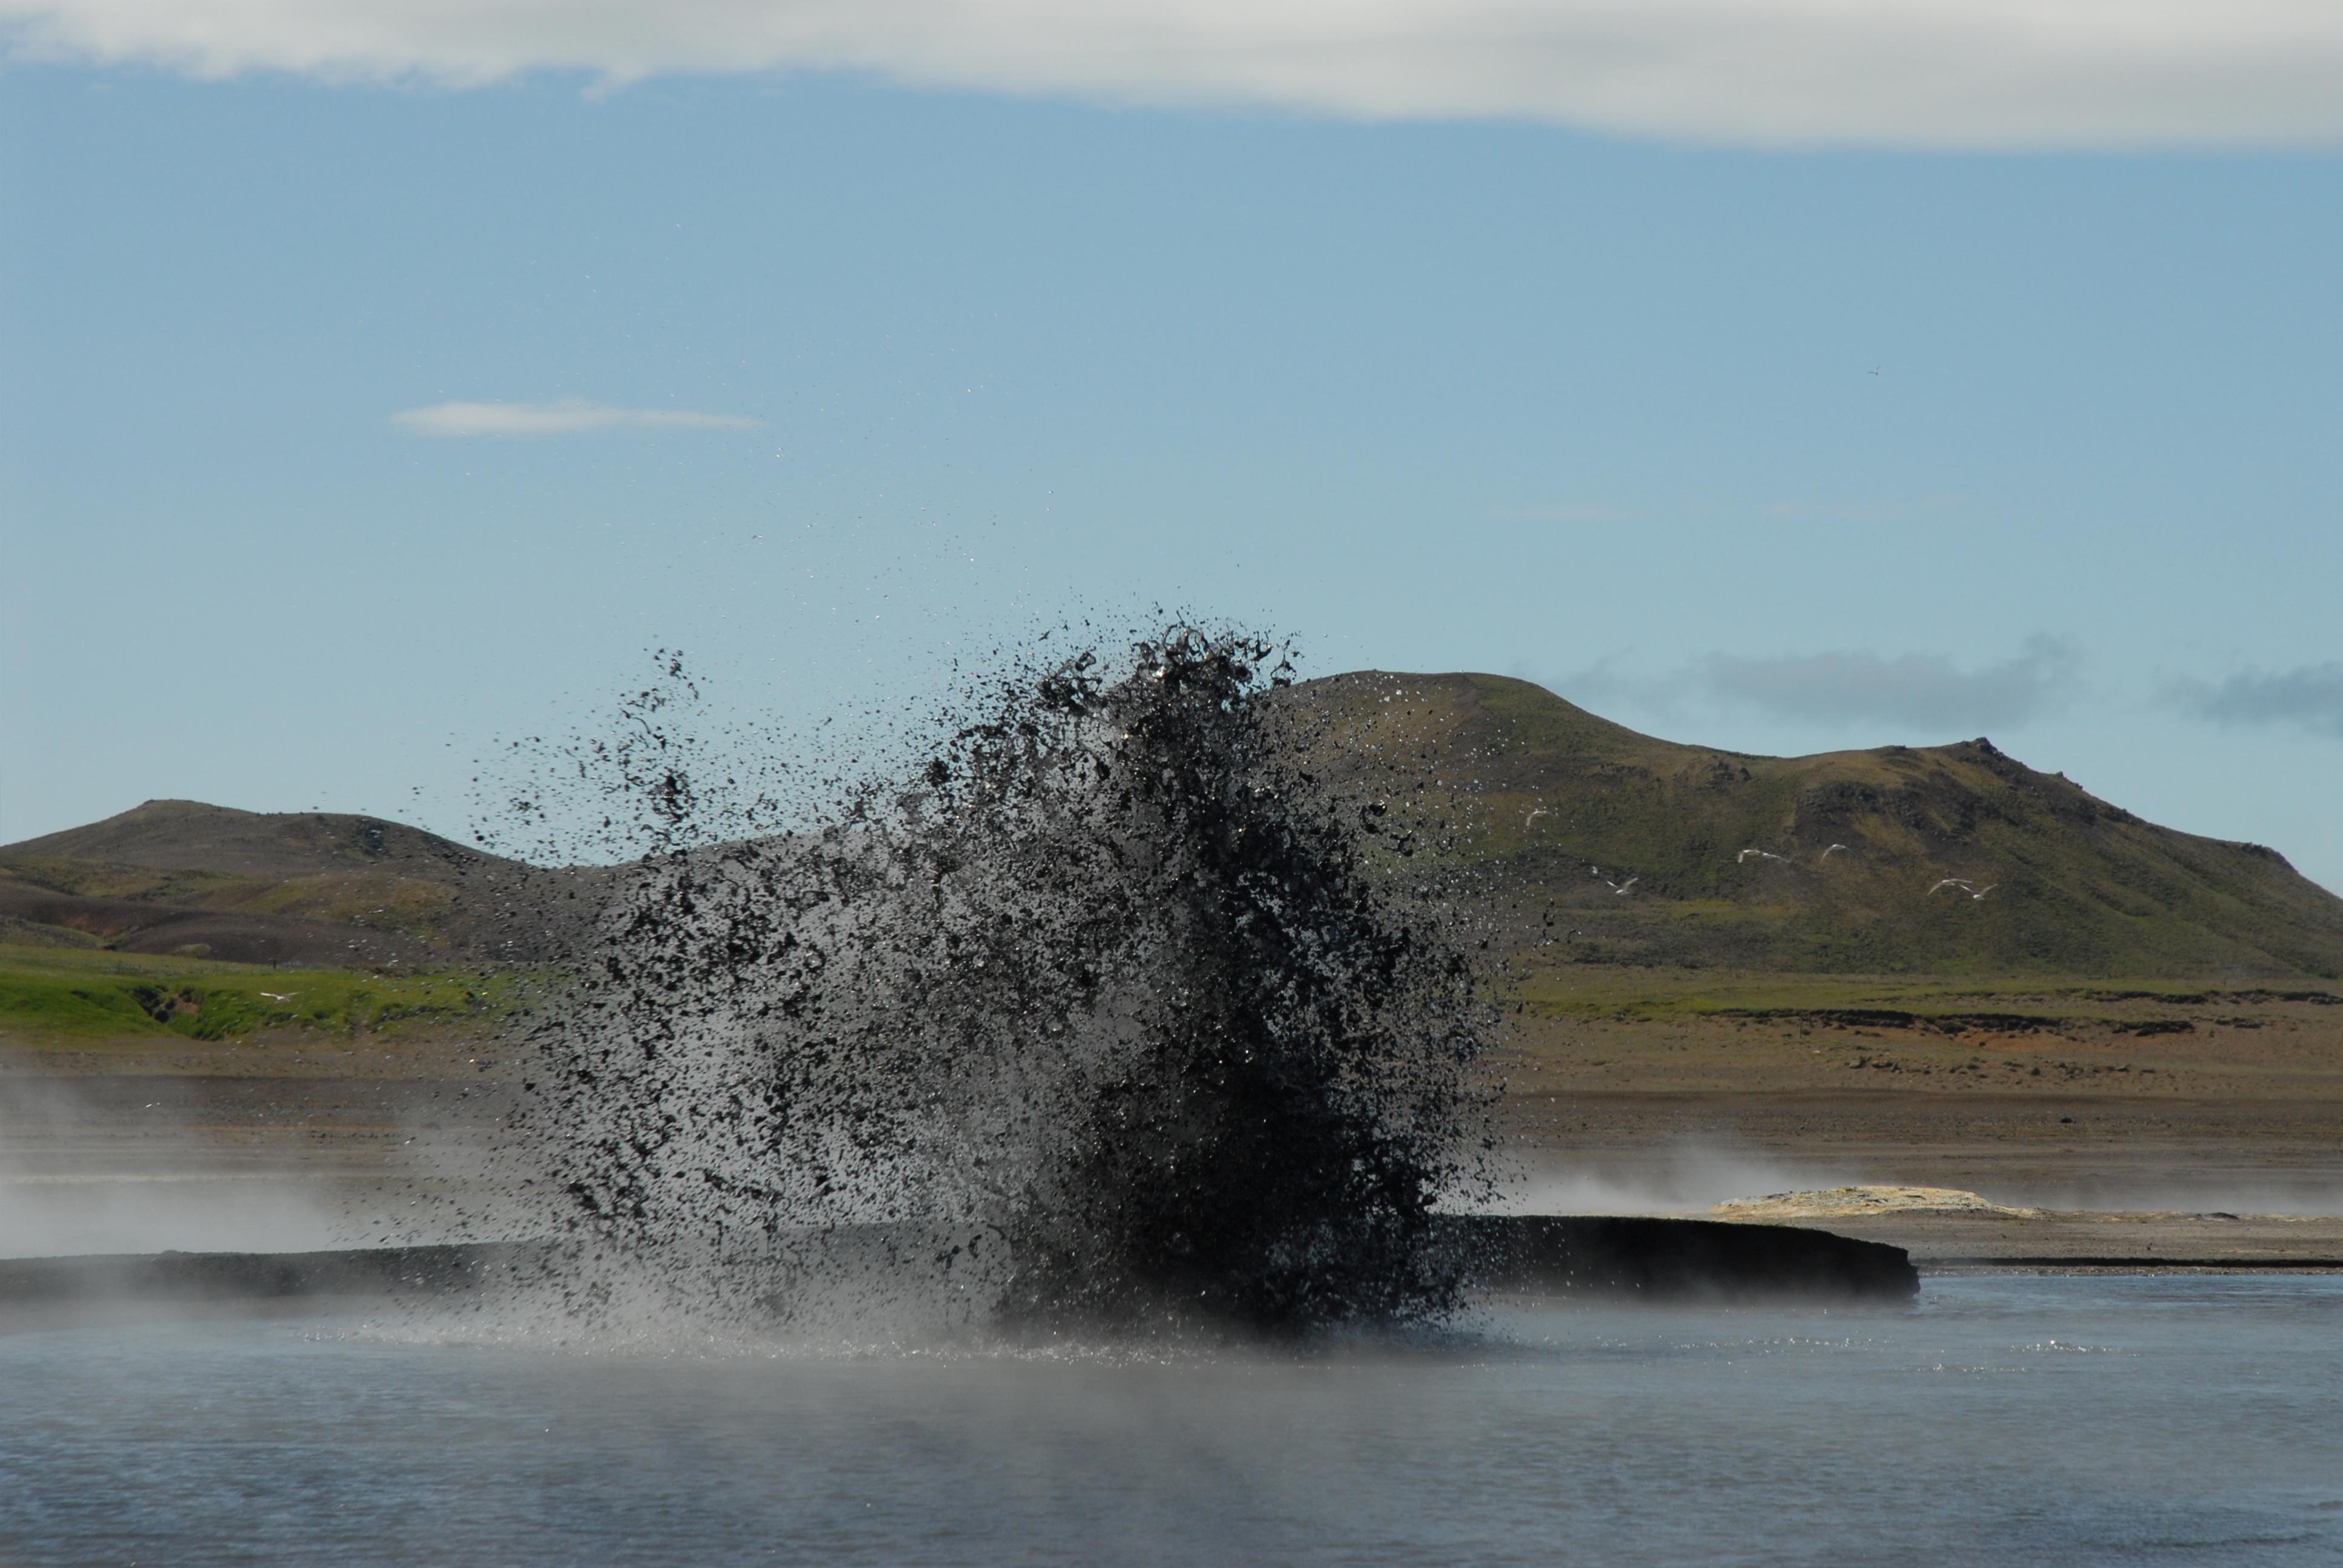 Geothermie Keflavatan Island, Islande eruption Keflavatan, voyage islande geologie